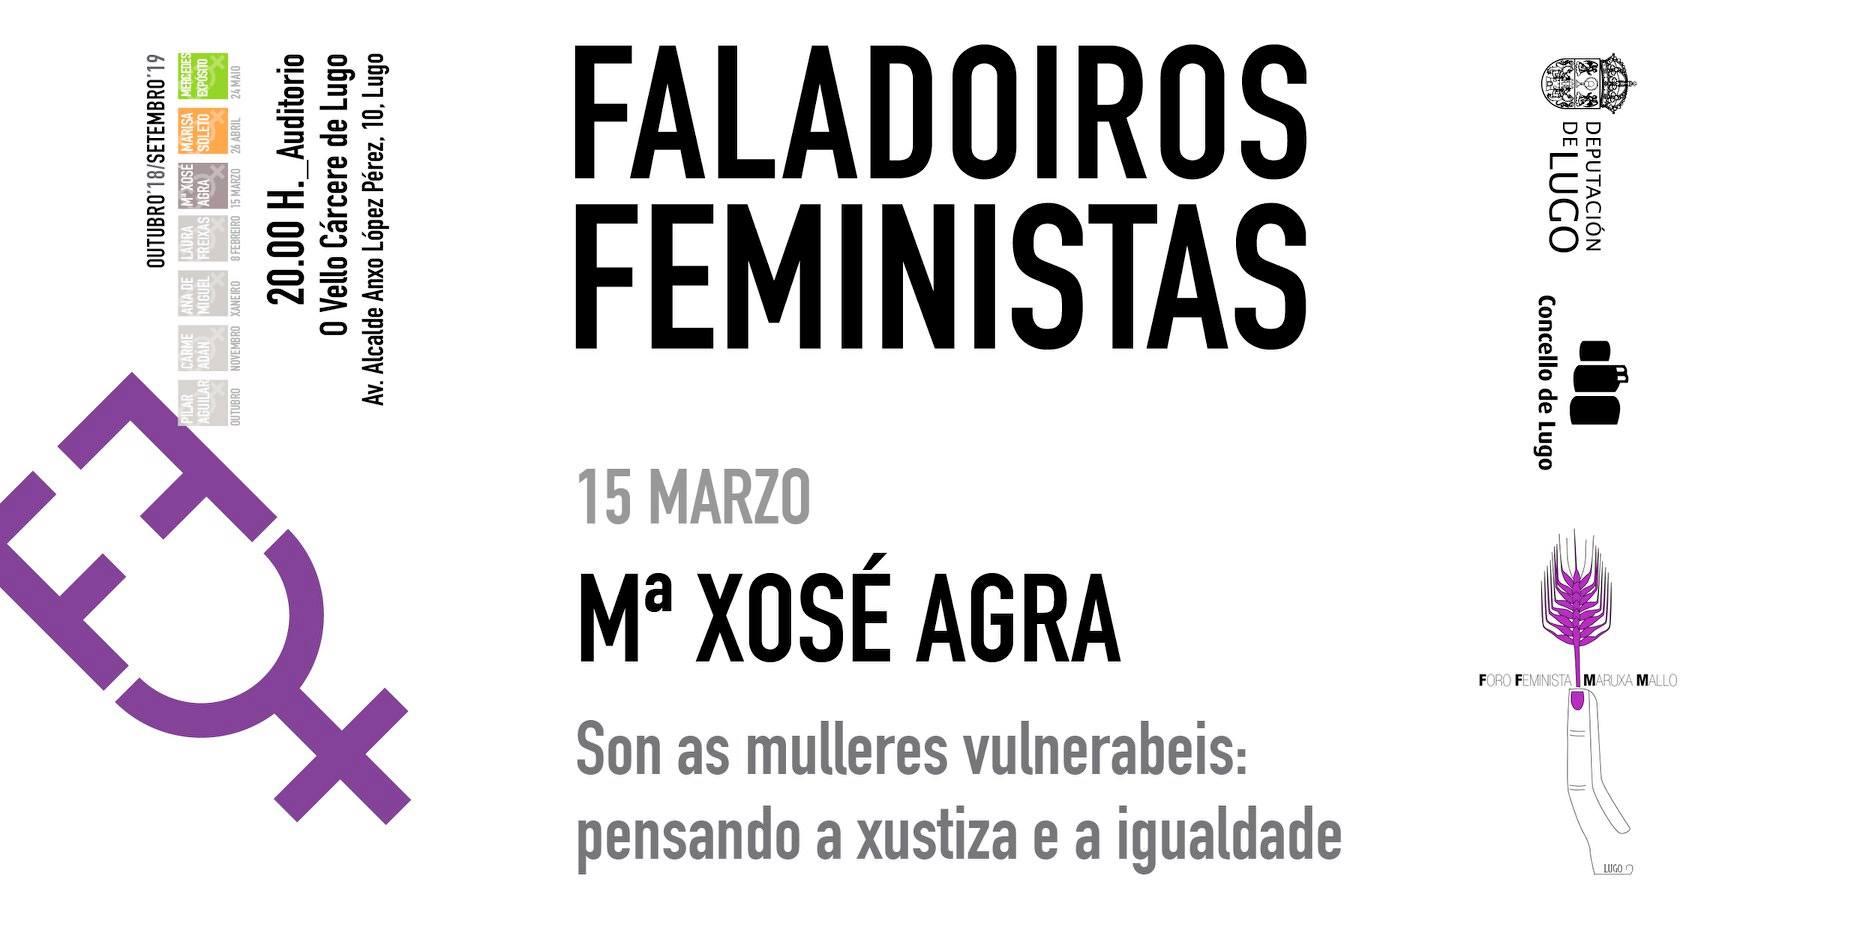 faladoiros-feministas